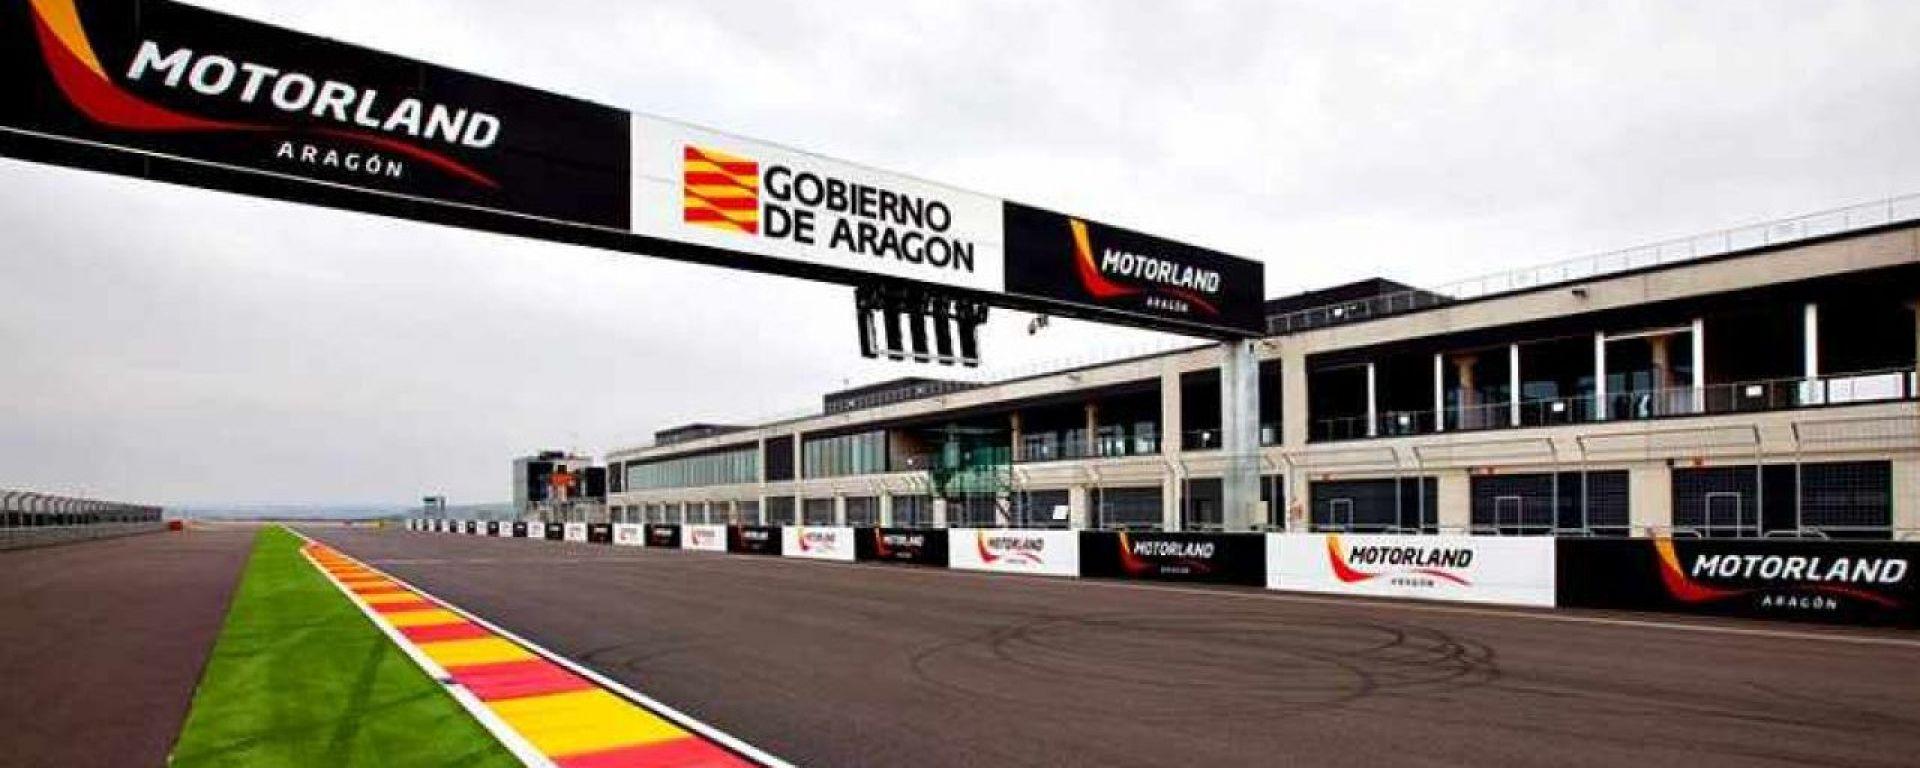 MotorLand Aragon, Alcaniz